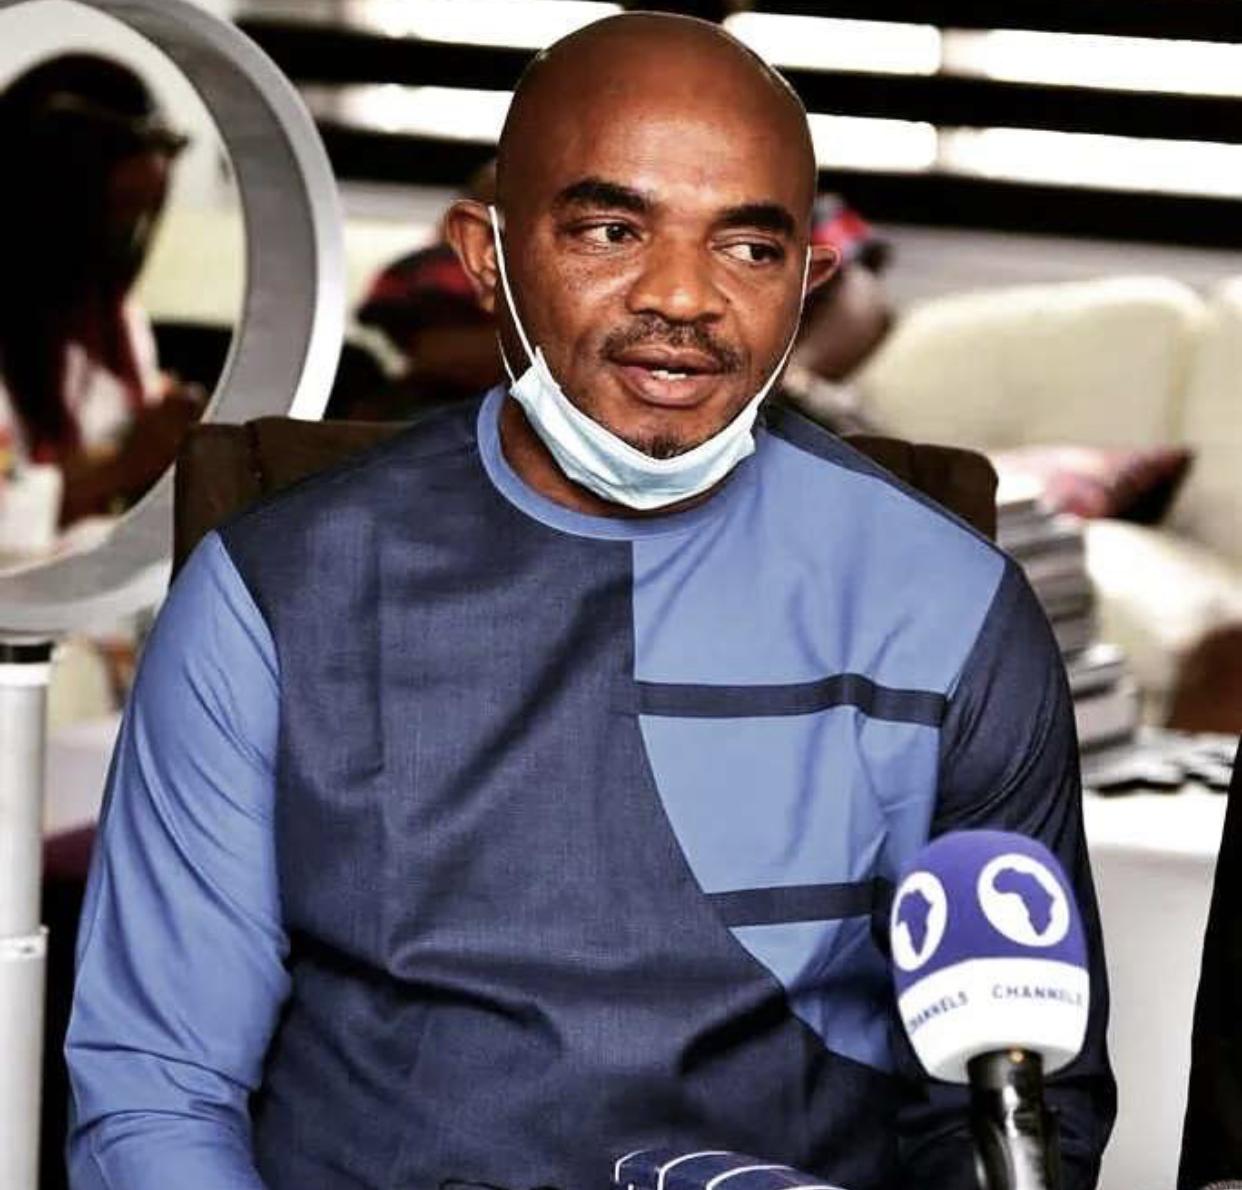 Nigeria: BBNaija - Nollywood, Not Dumping Ground for